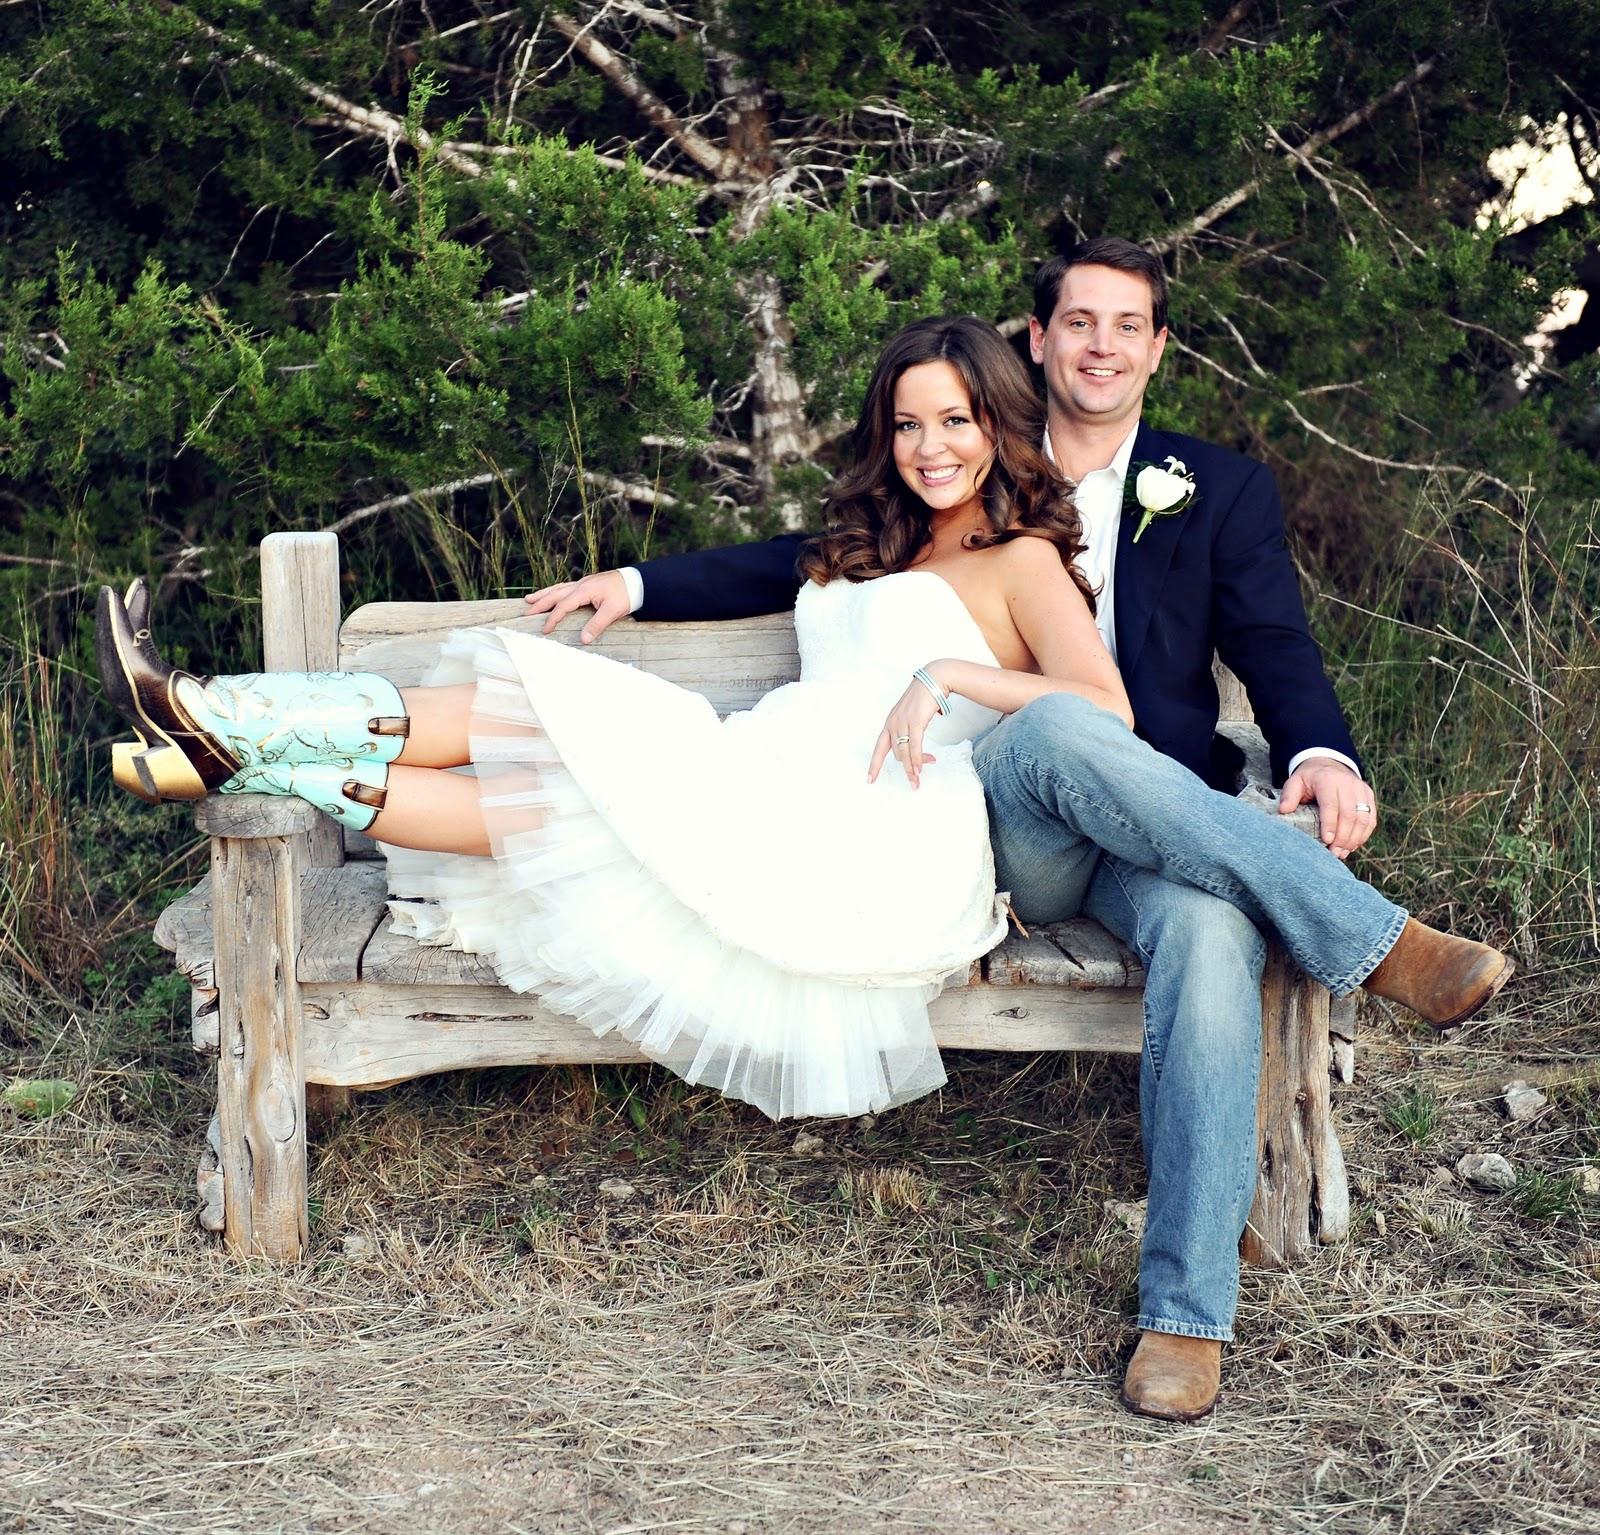 green bay | Wedding Dresses: What I\'m Loving...I Wanna Be a CowGirl